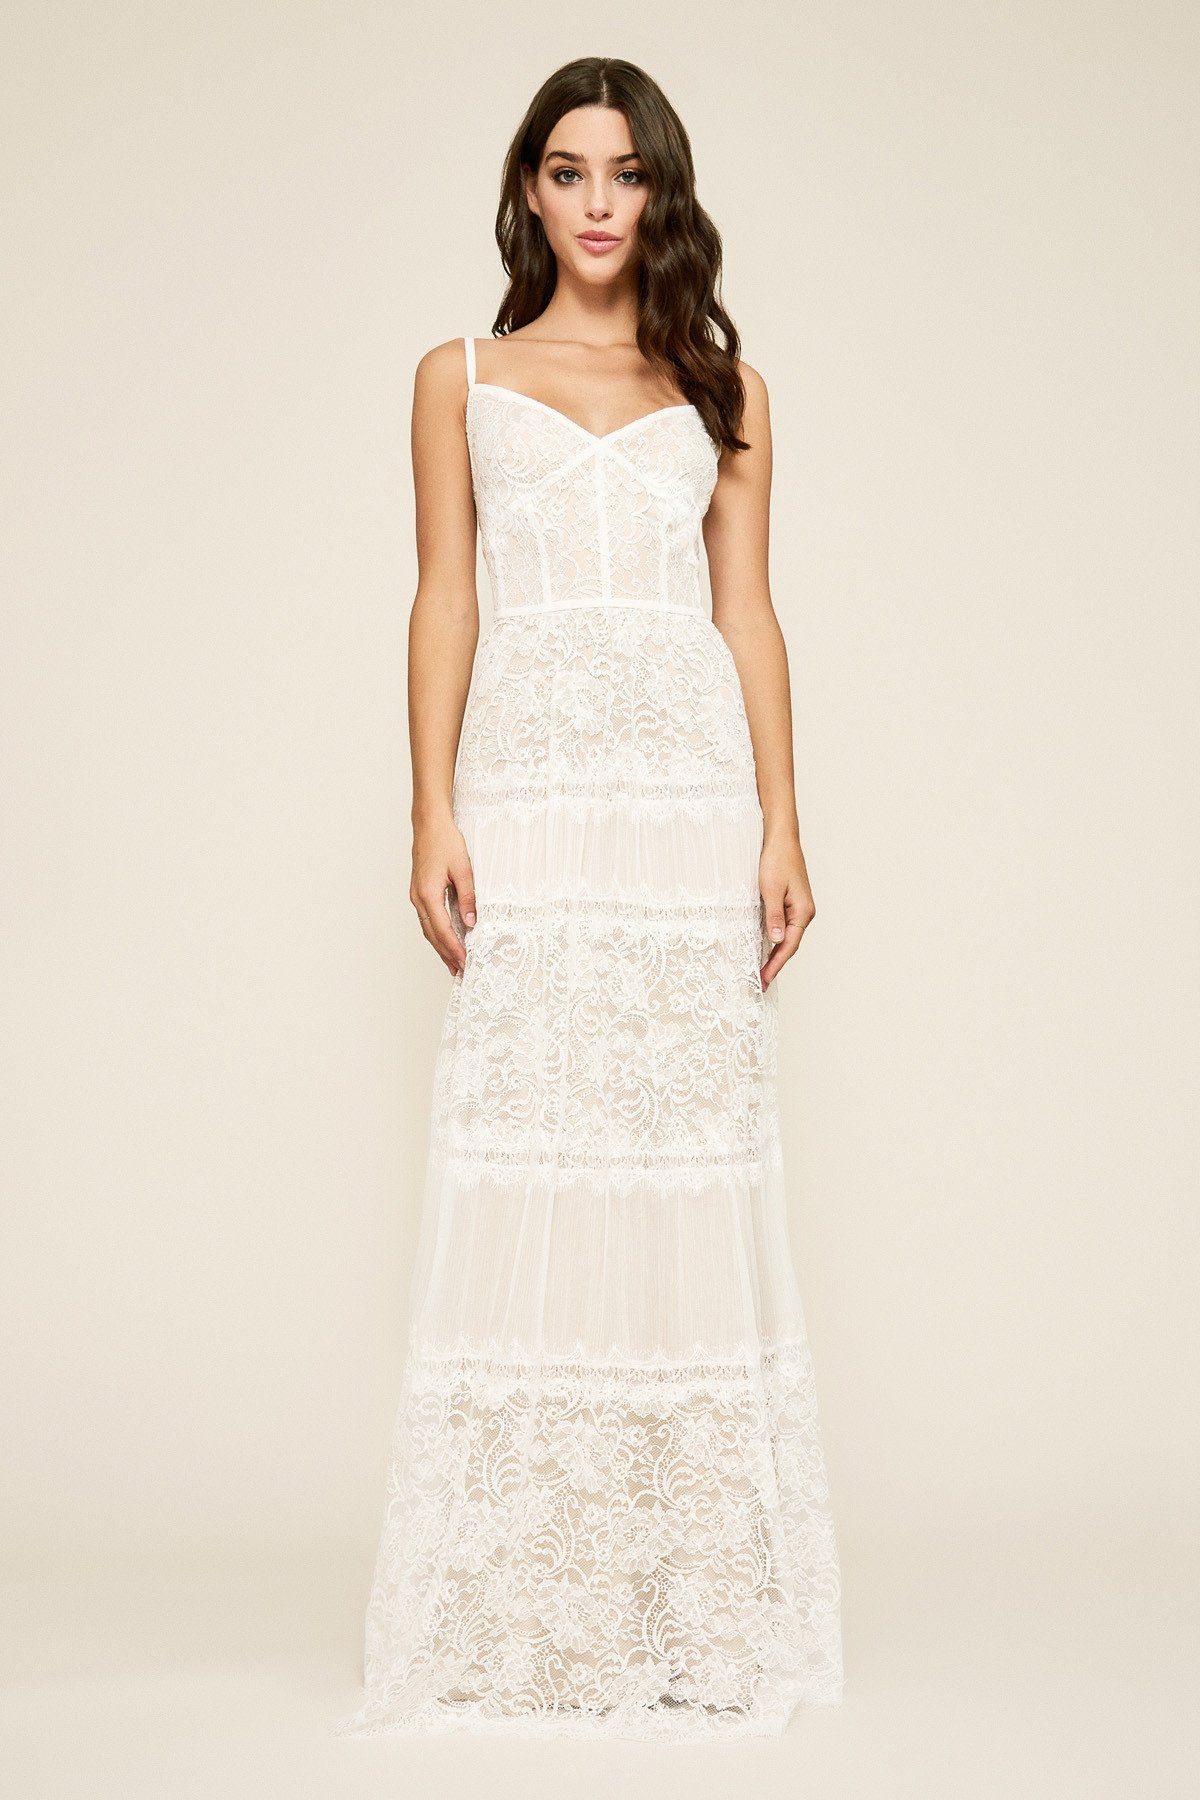 Tadashi Shoji Sleeveless Lace V Neck A Line Dress Affordable Wedding Dresses Lace Lace Beach Dress Dresses [ 1800 x 1200 Pixel ]